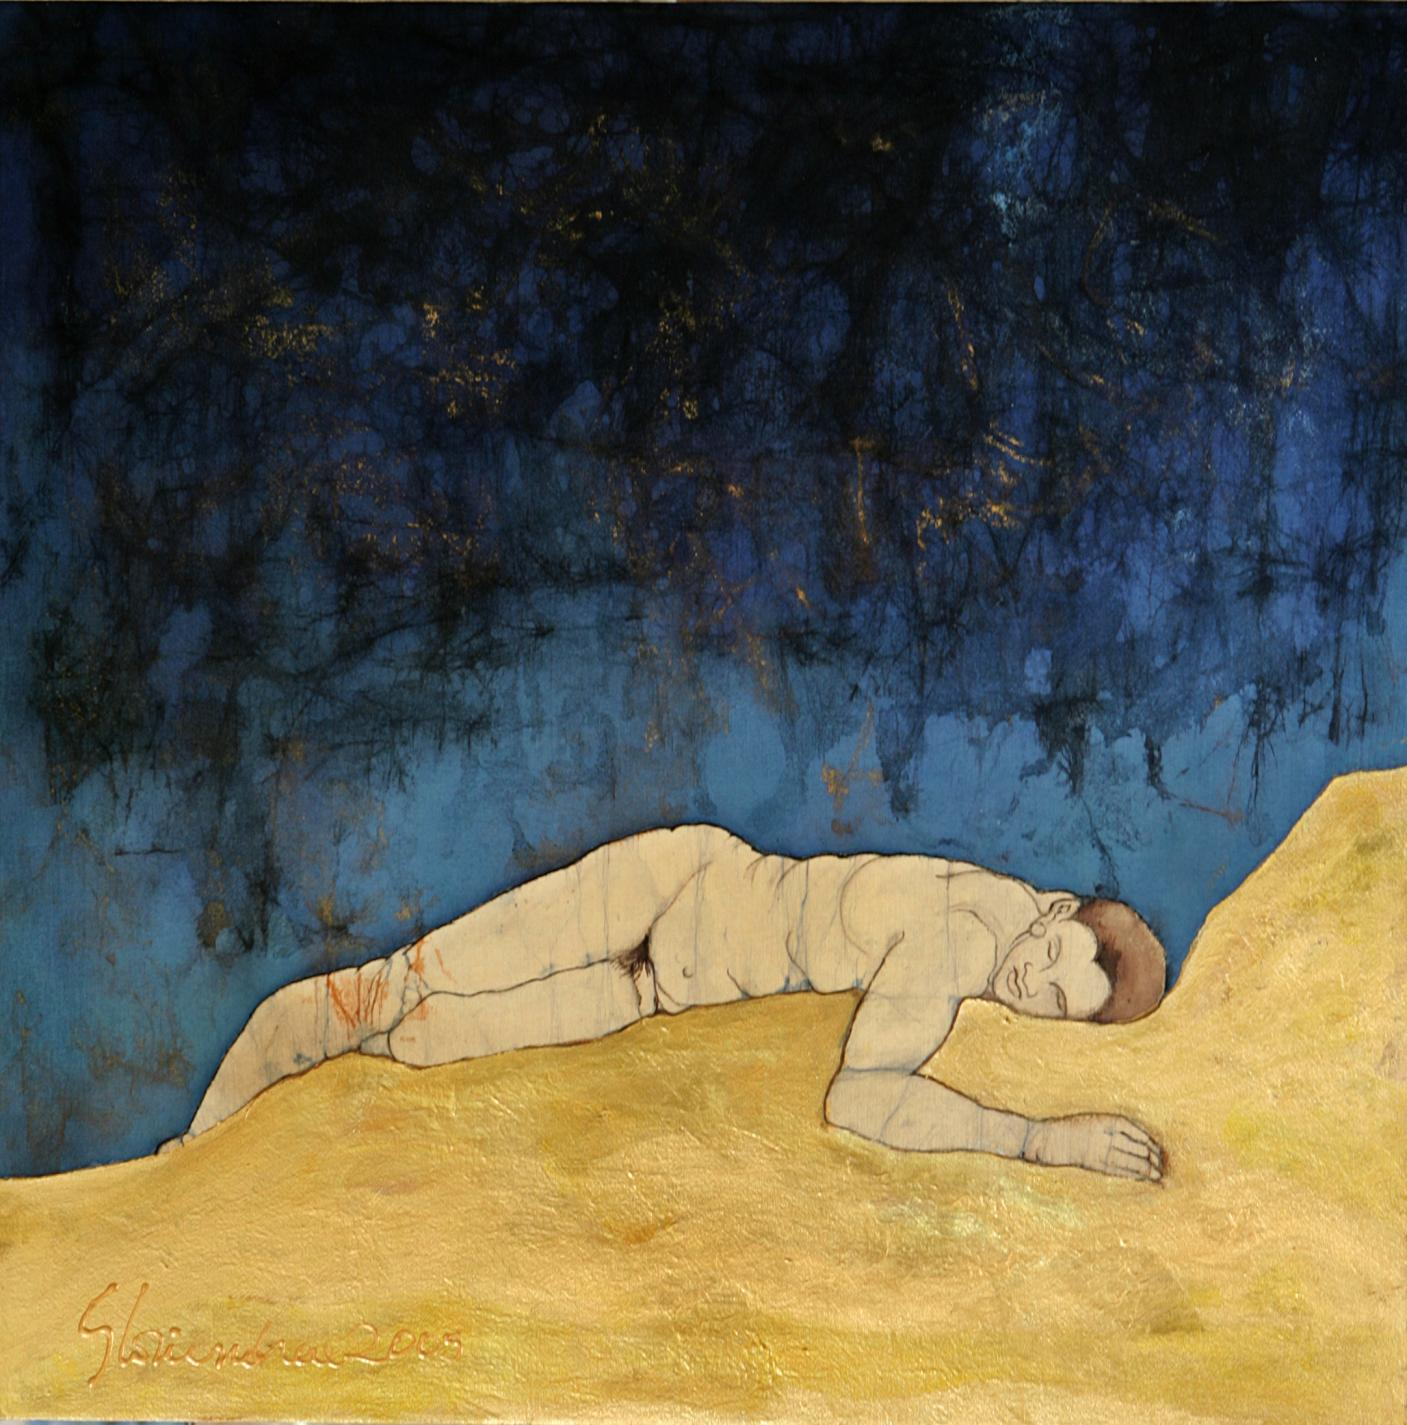 """Hombre en la noche"" (2006) - Gloriandrea Pérez"